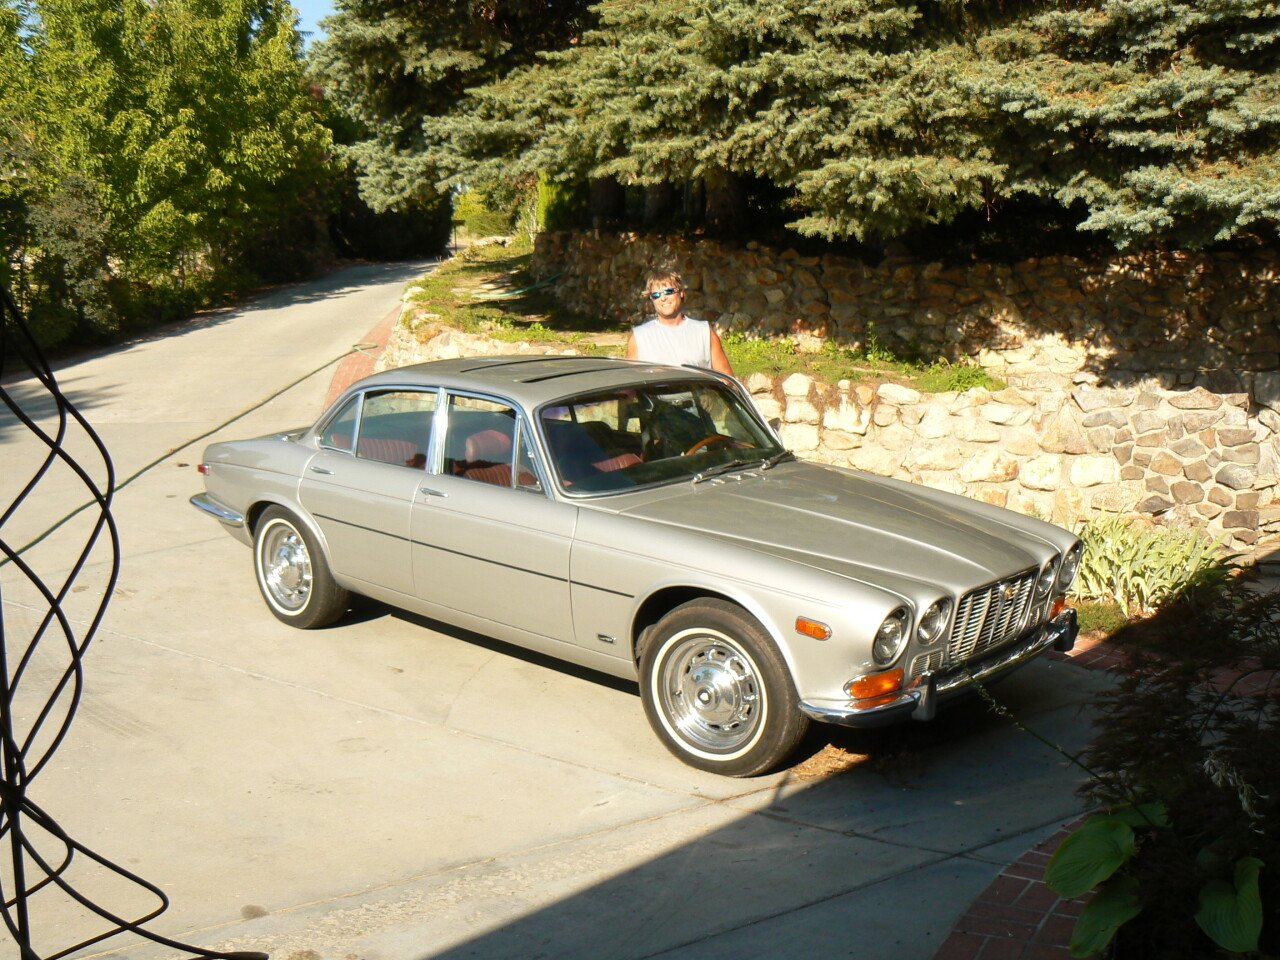 Classic Cars For Sale Auto Trader Com: 1972 Jaguar XJ6 For Sale Near Draper, Utah 84020